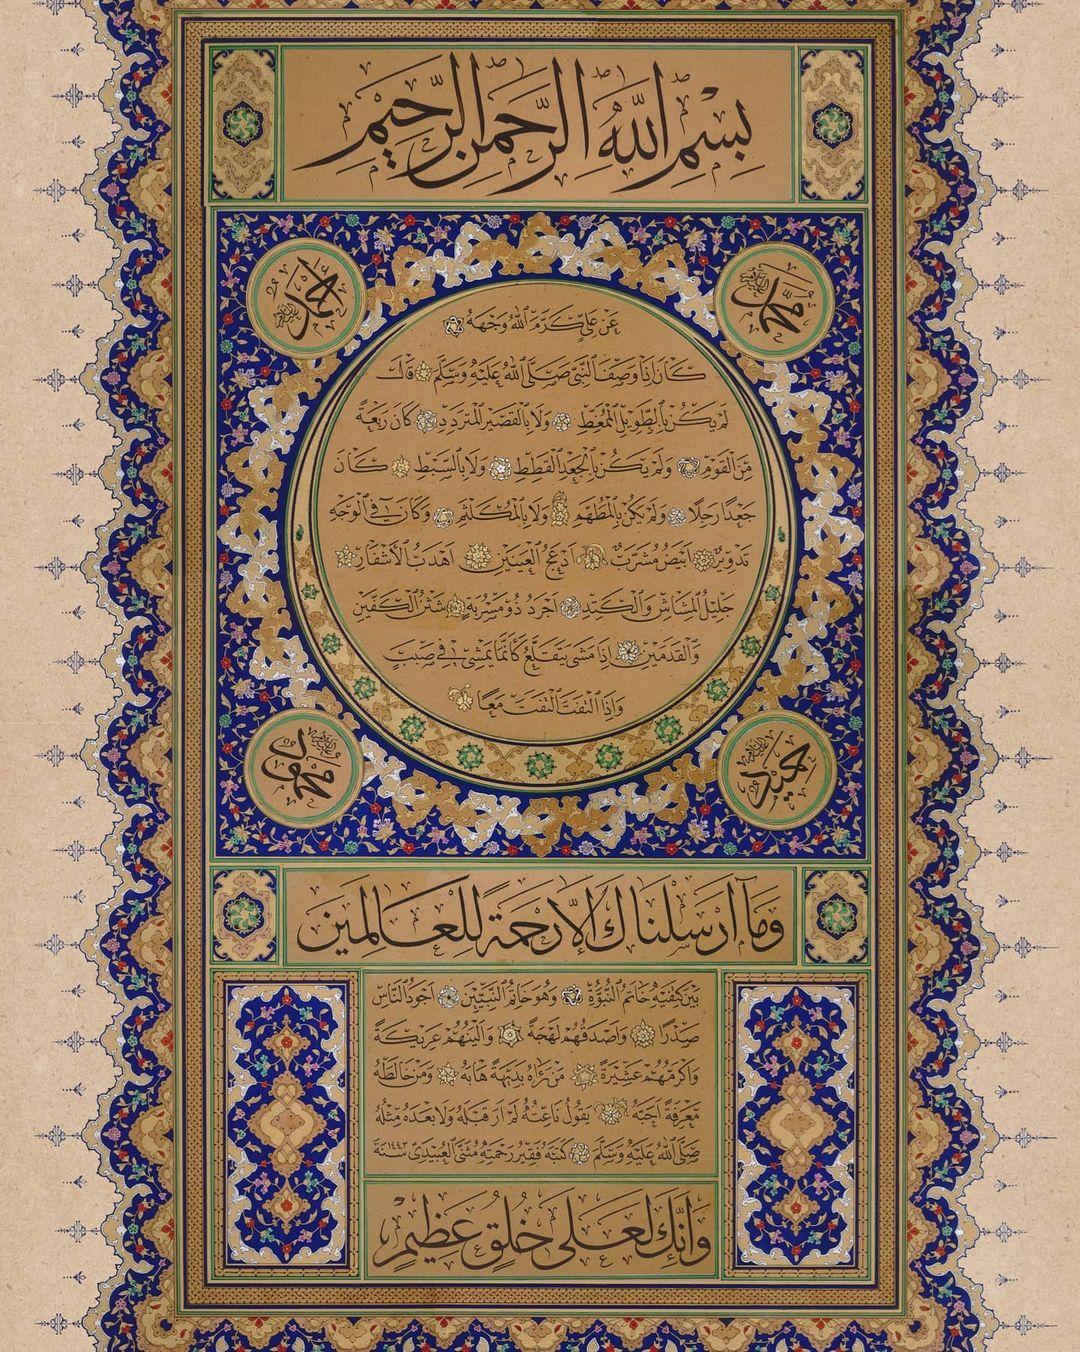 khat/hat/kat Tsulust/Thuluth Mothana Alobaydi حلية جديدة مذهبة design of zagrfa is for @sayin.ayse… 1131